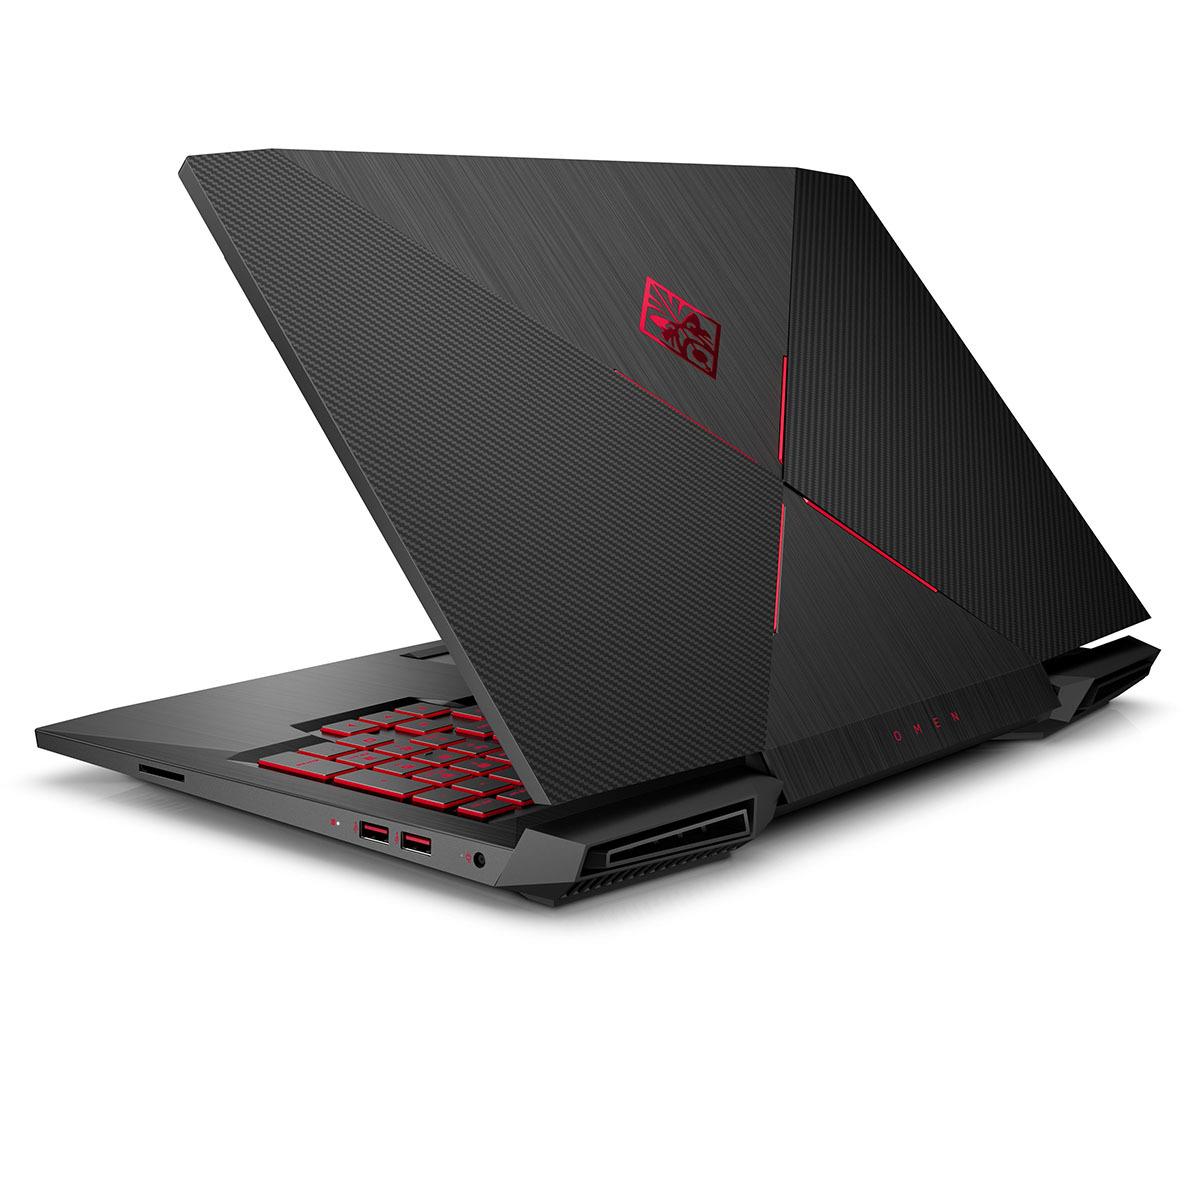 Chedraui: Laptop Omen i7-7700HQ NVIDIA GTX 1050 1TB 8GB RAM